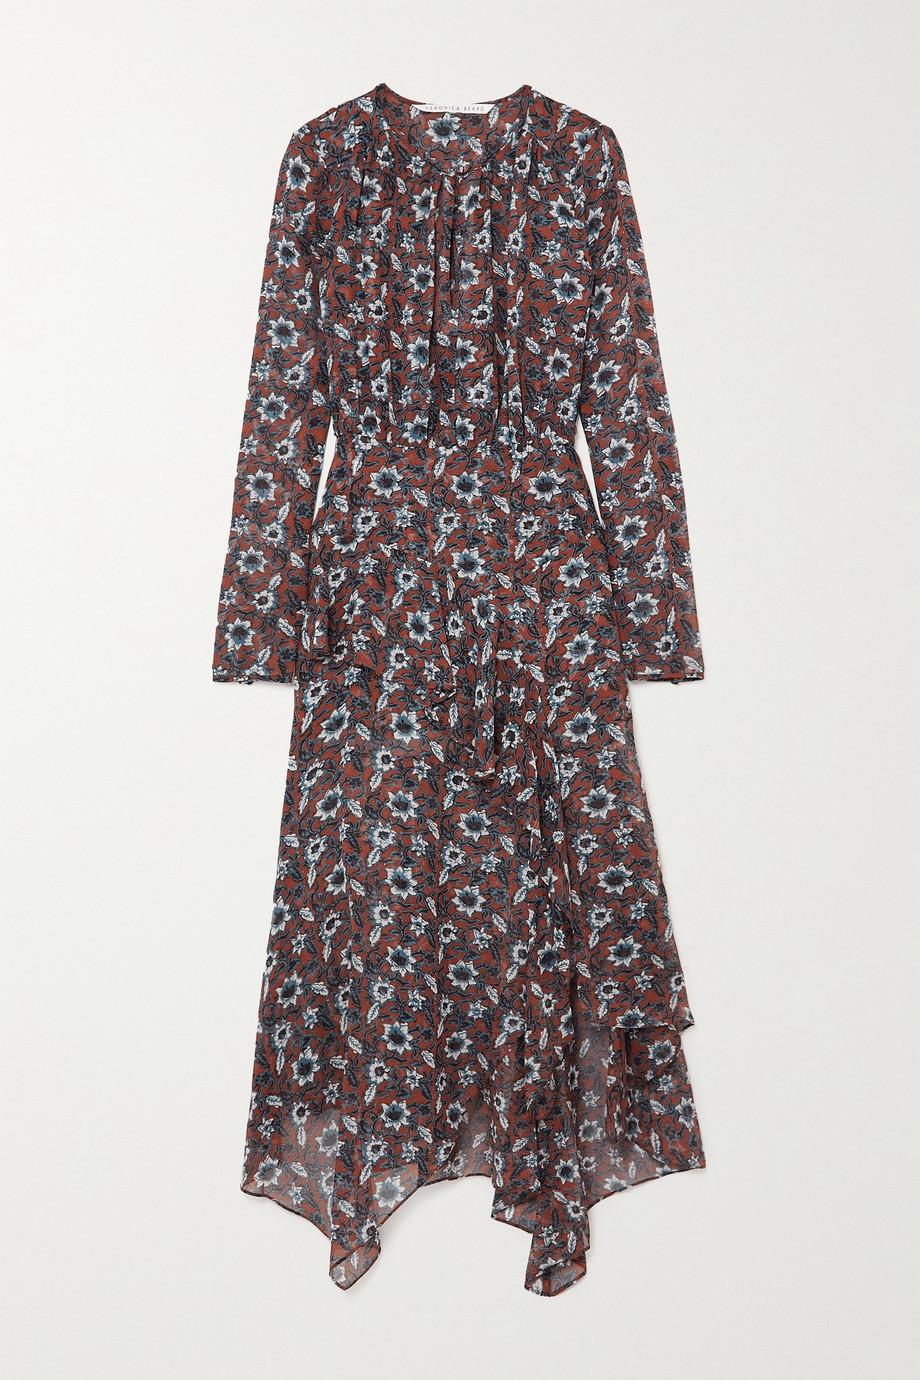 Veronica Beard Sazan asymmetric ruffled floral-print silk-chiffon midi dress